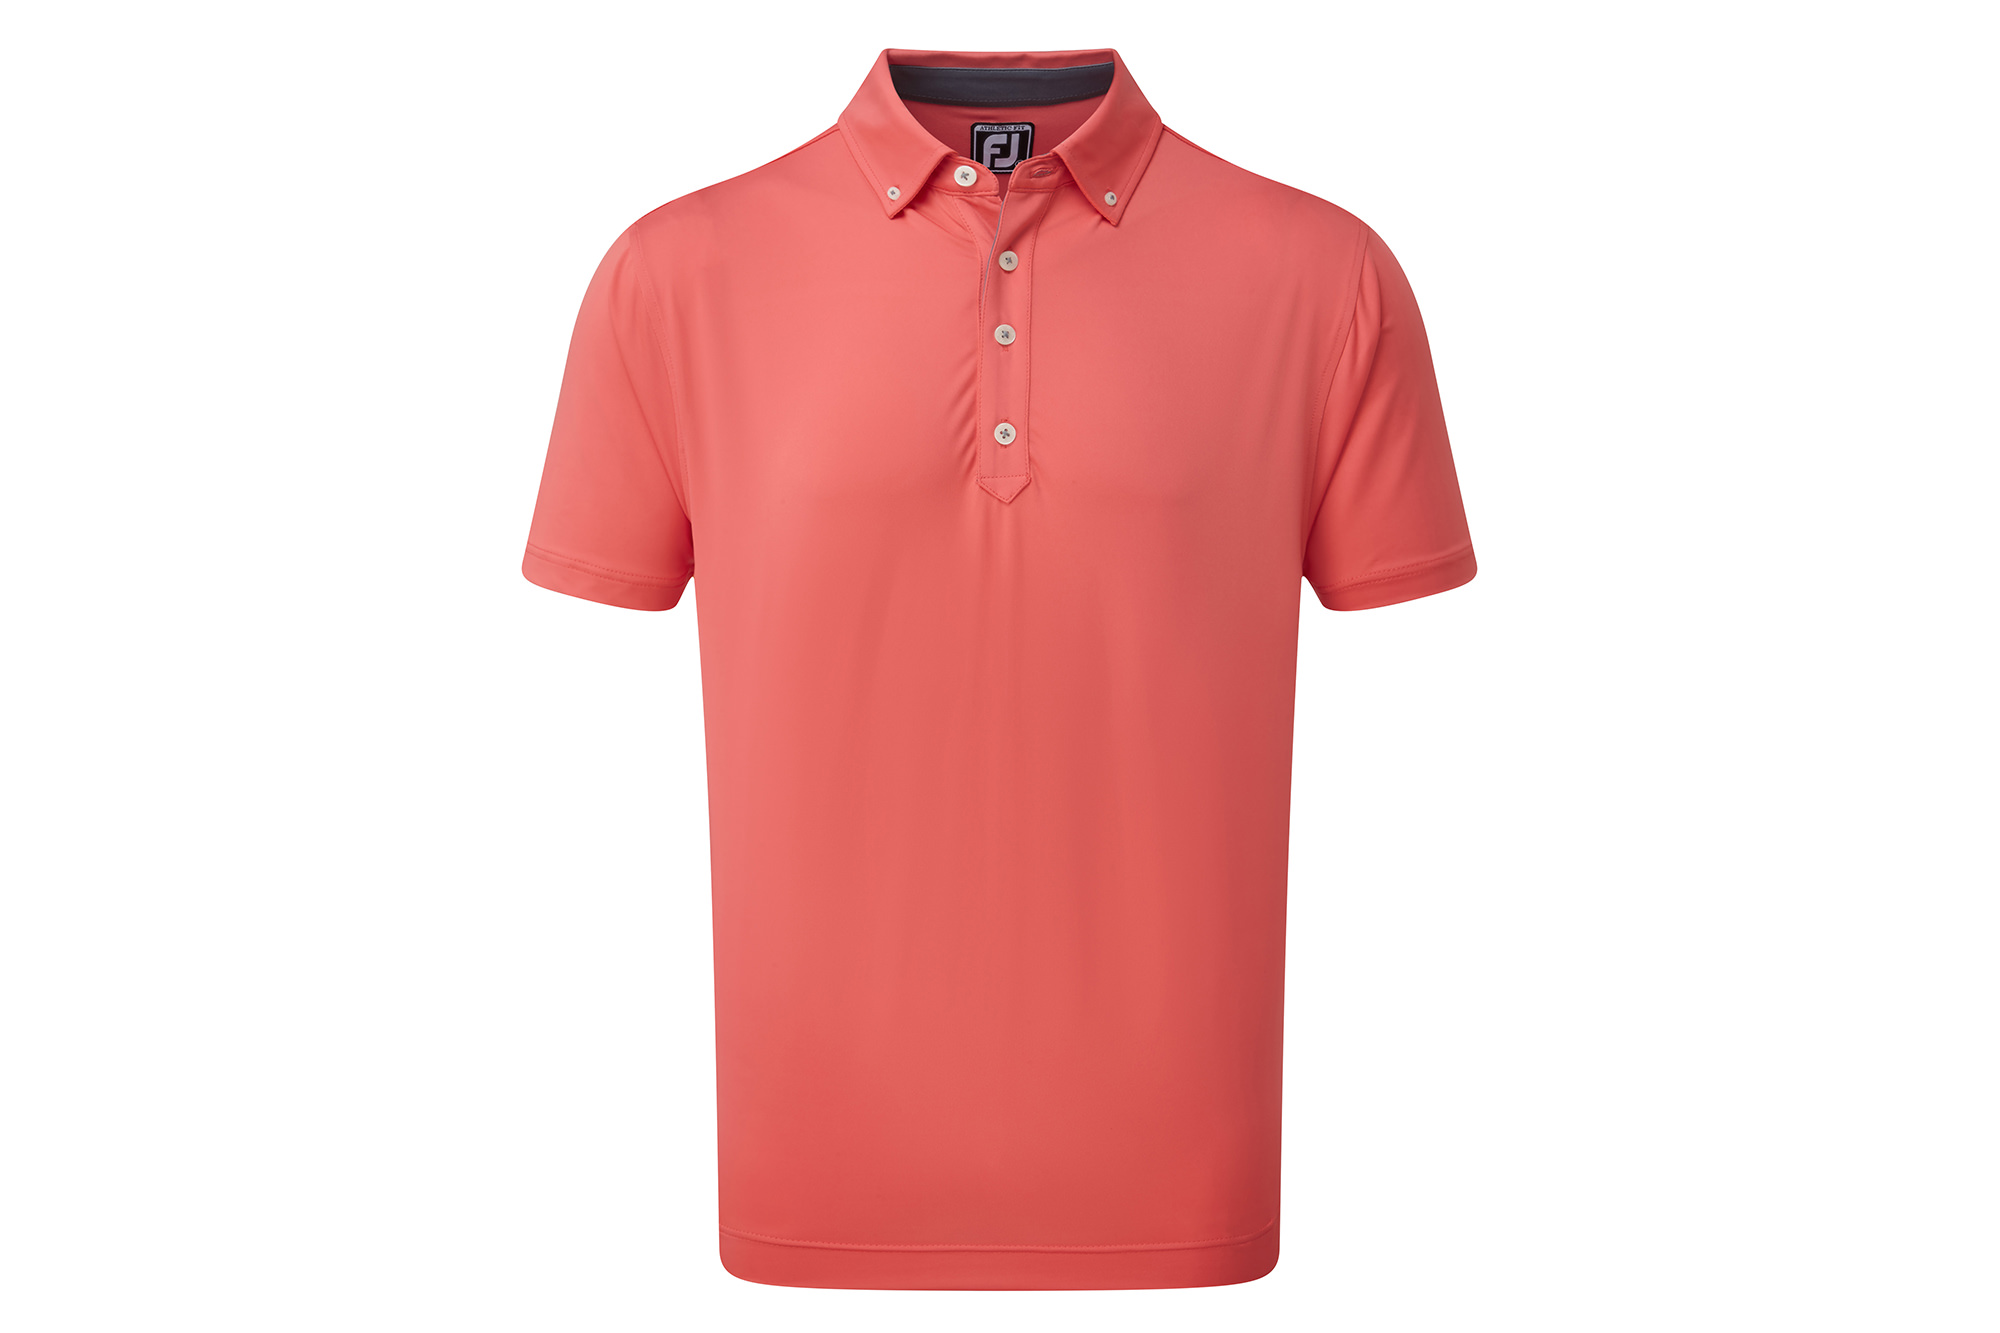 New golf clothes